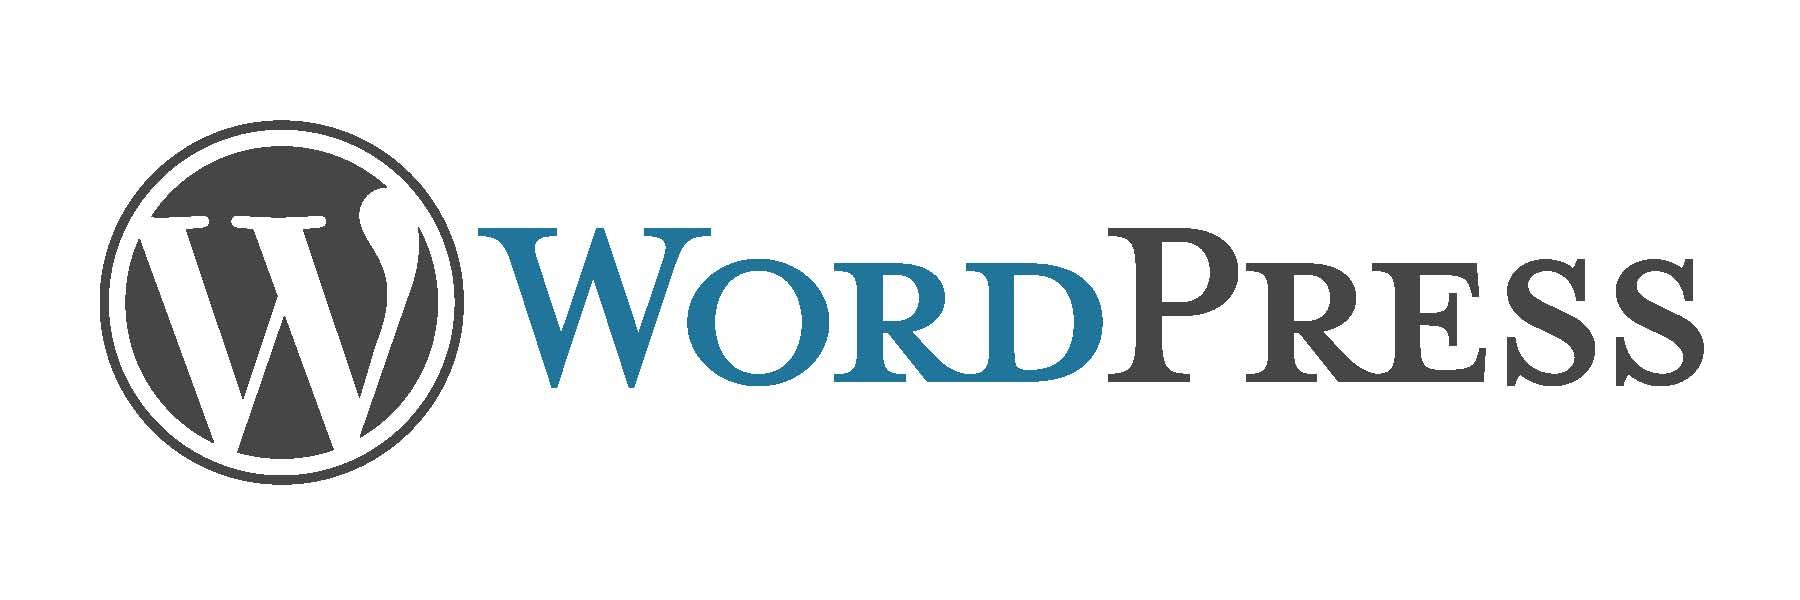 Виртуальный hosting для cms wordpress